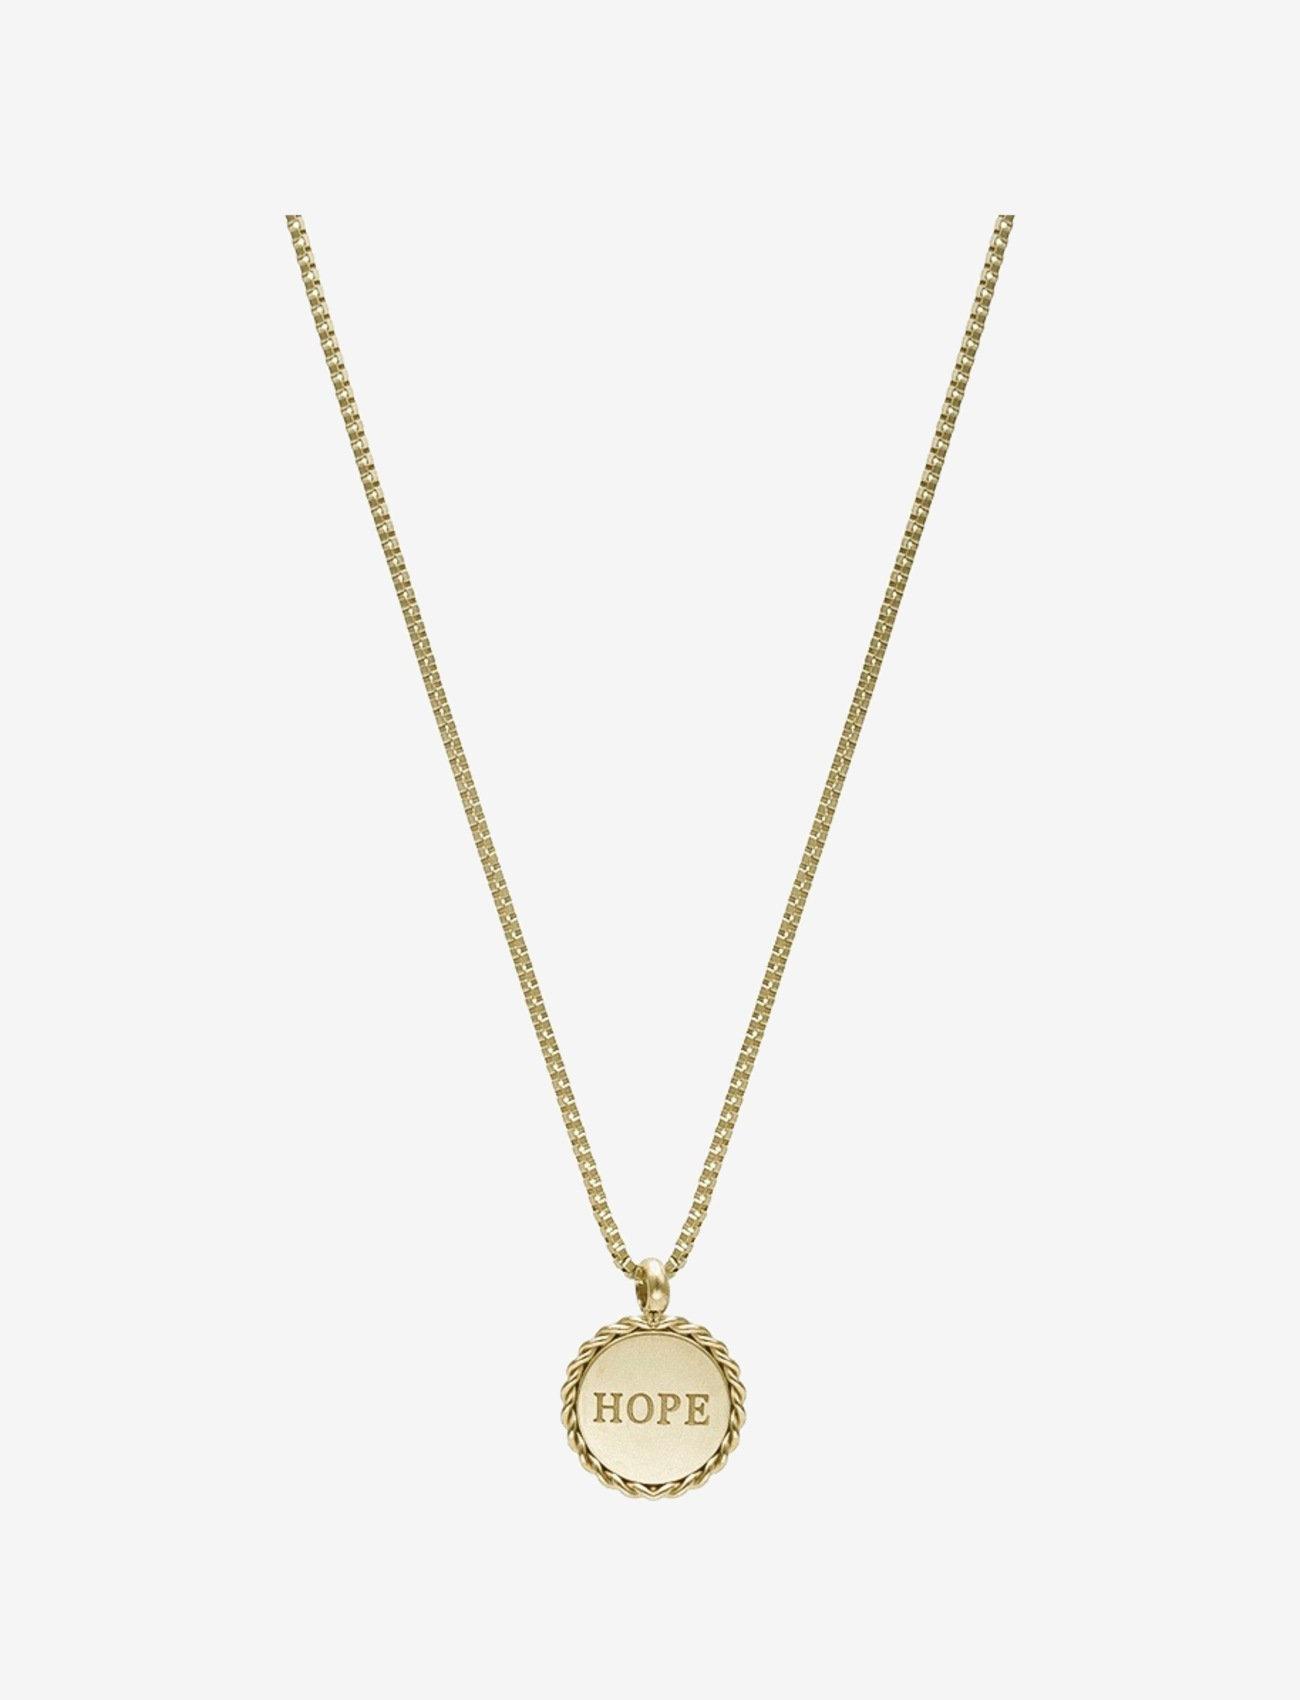 Bud to rose - Hope Short Necklace Steel - kettingen met hanger - gold - 0